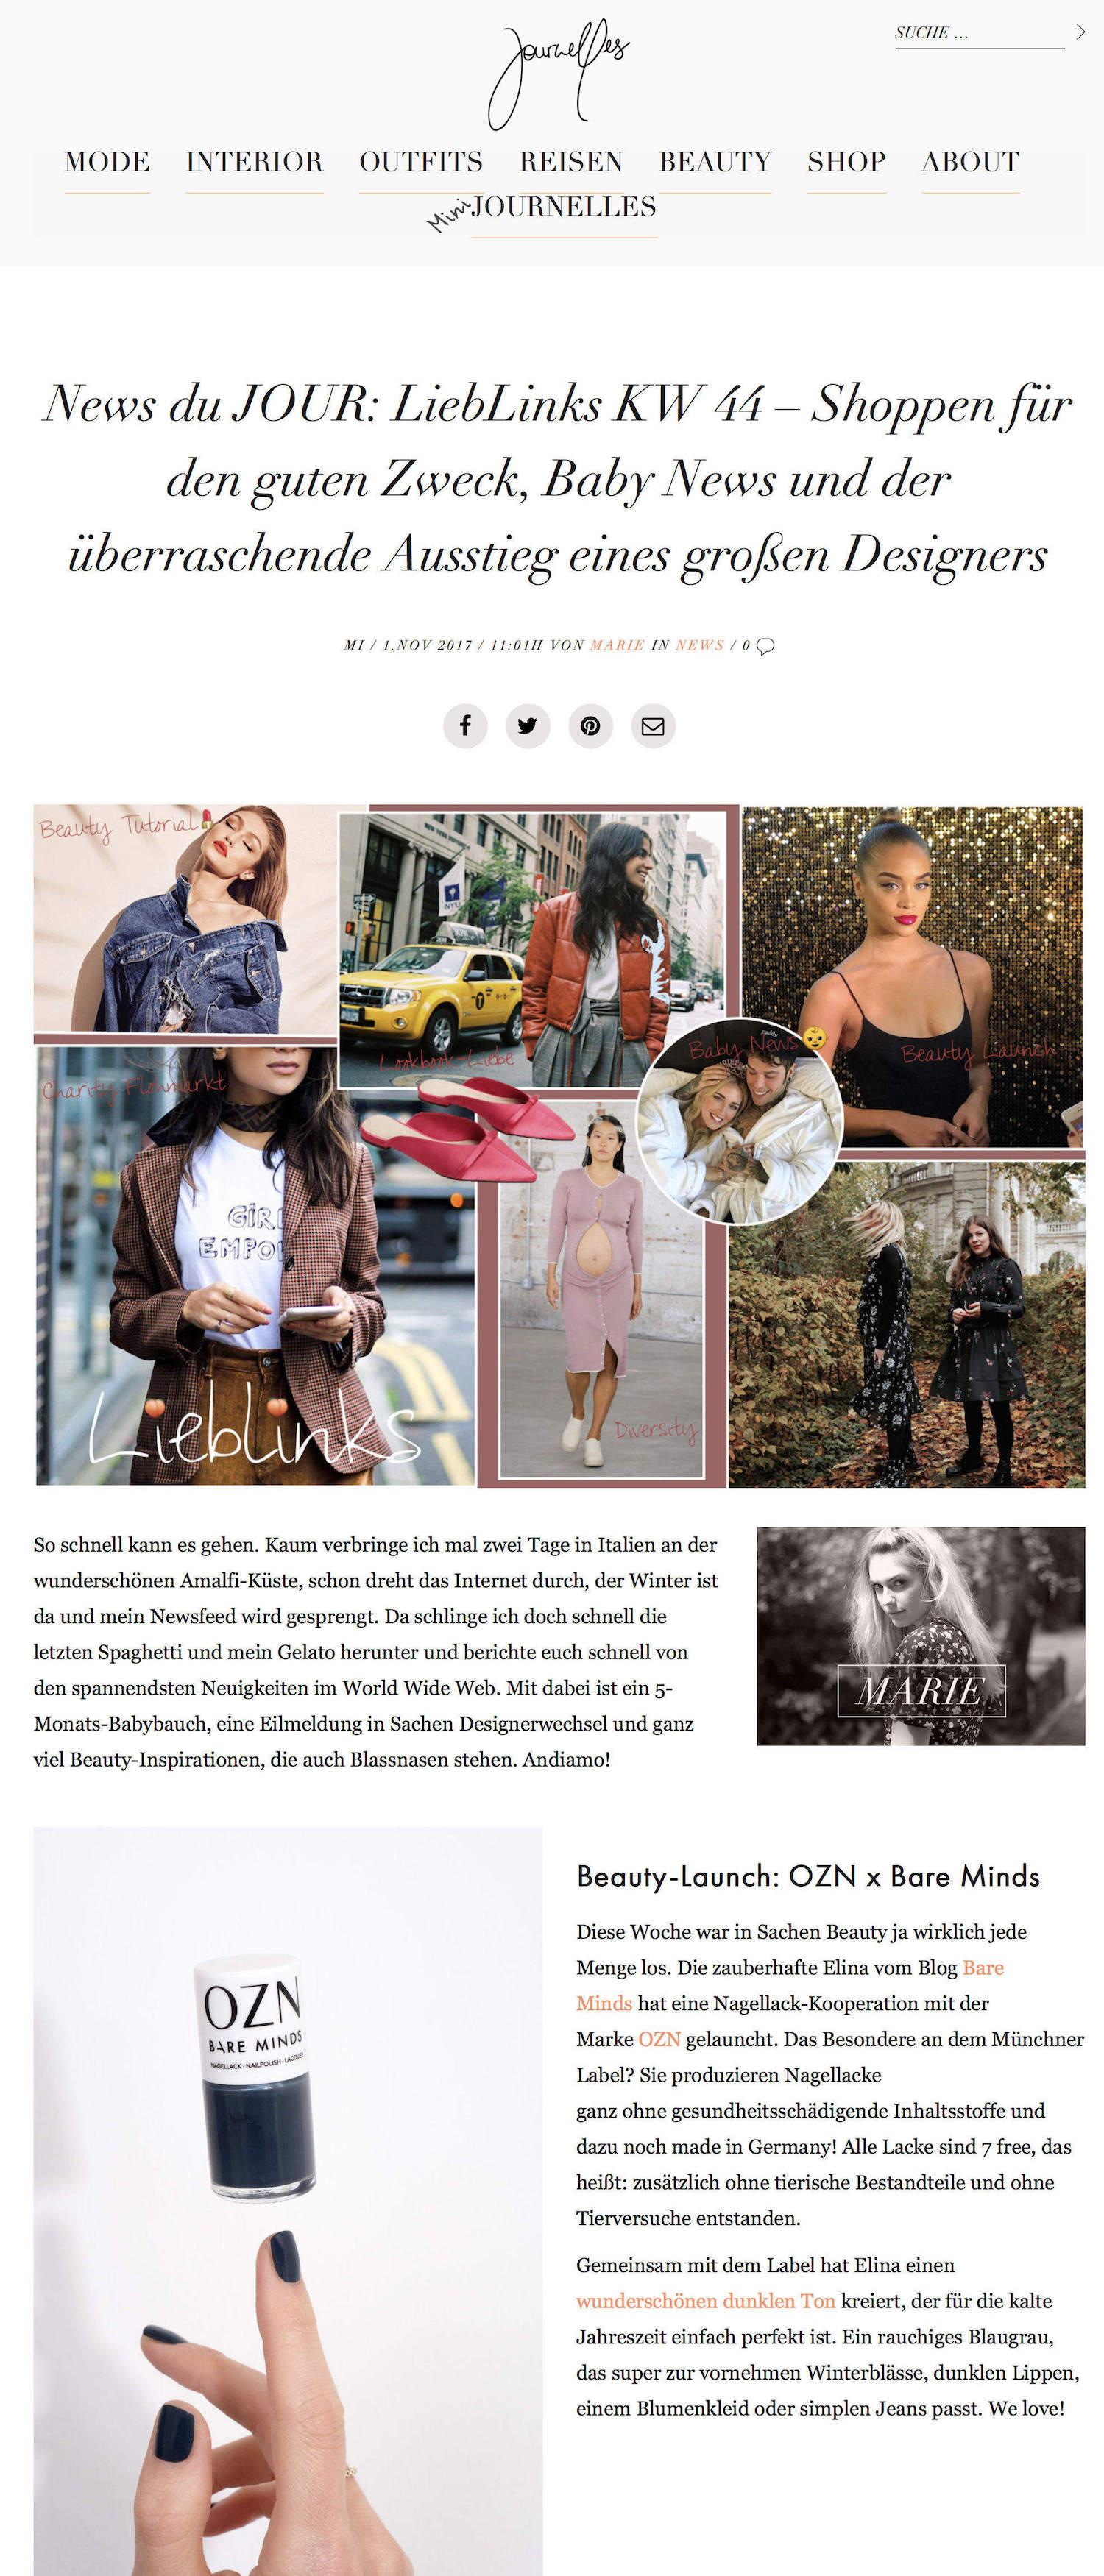 Beautyblog-Beautyblogger-BARE-MINDS-Elina-Neumann_www.journelles.de_1.11.2017_1.jpg